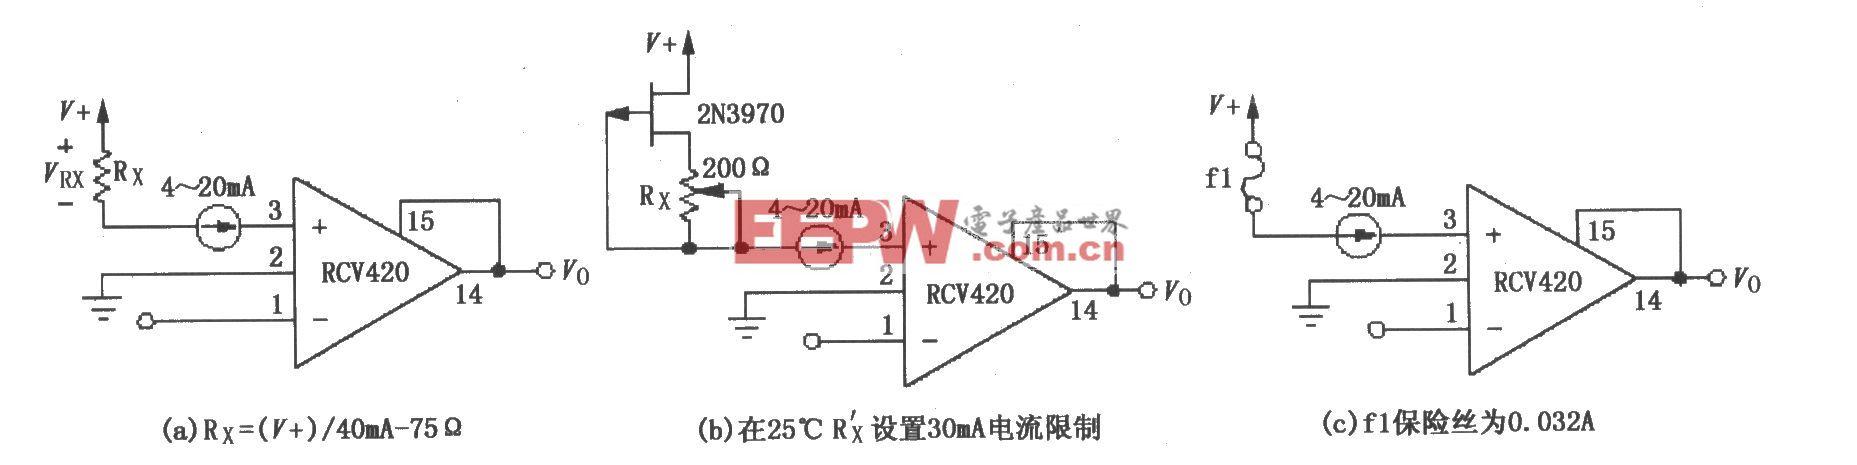 RCV420保護檢測電阻電路